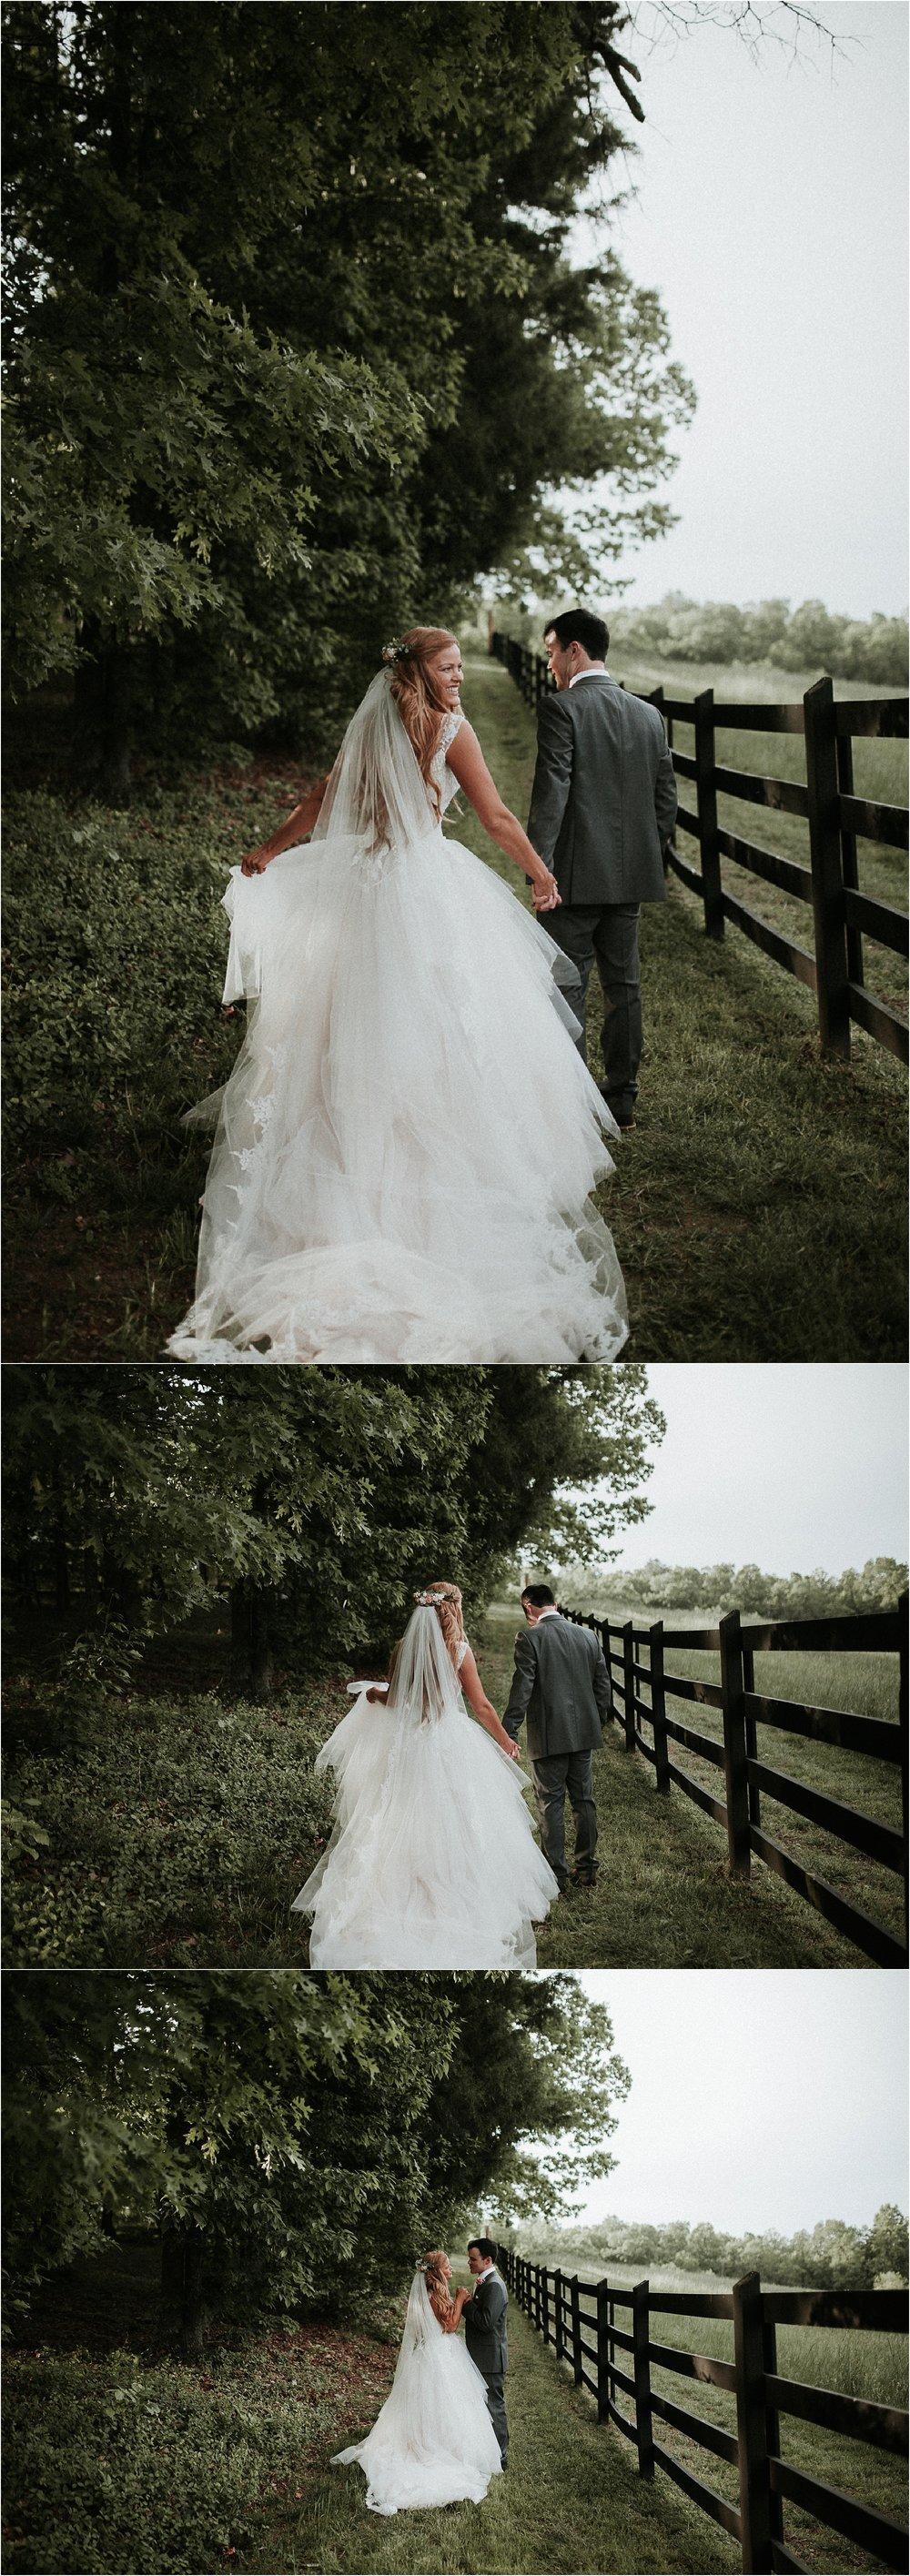 Carolina-Country-Weddings-Mount-Pleasant-nc-132.jpg